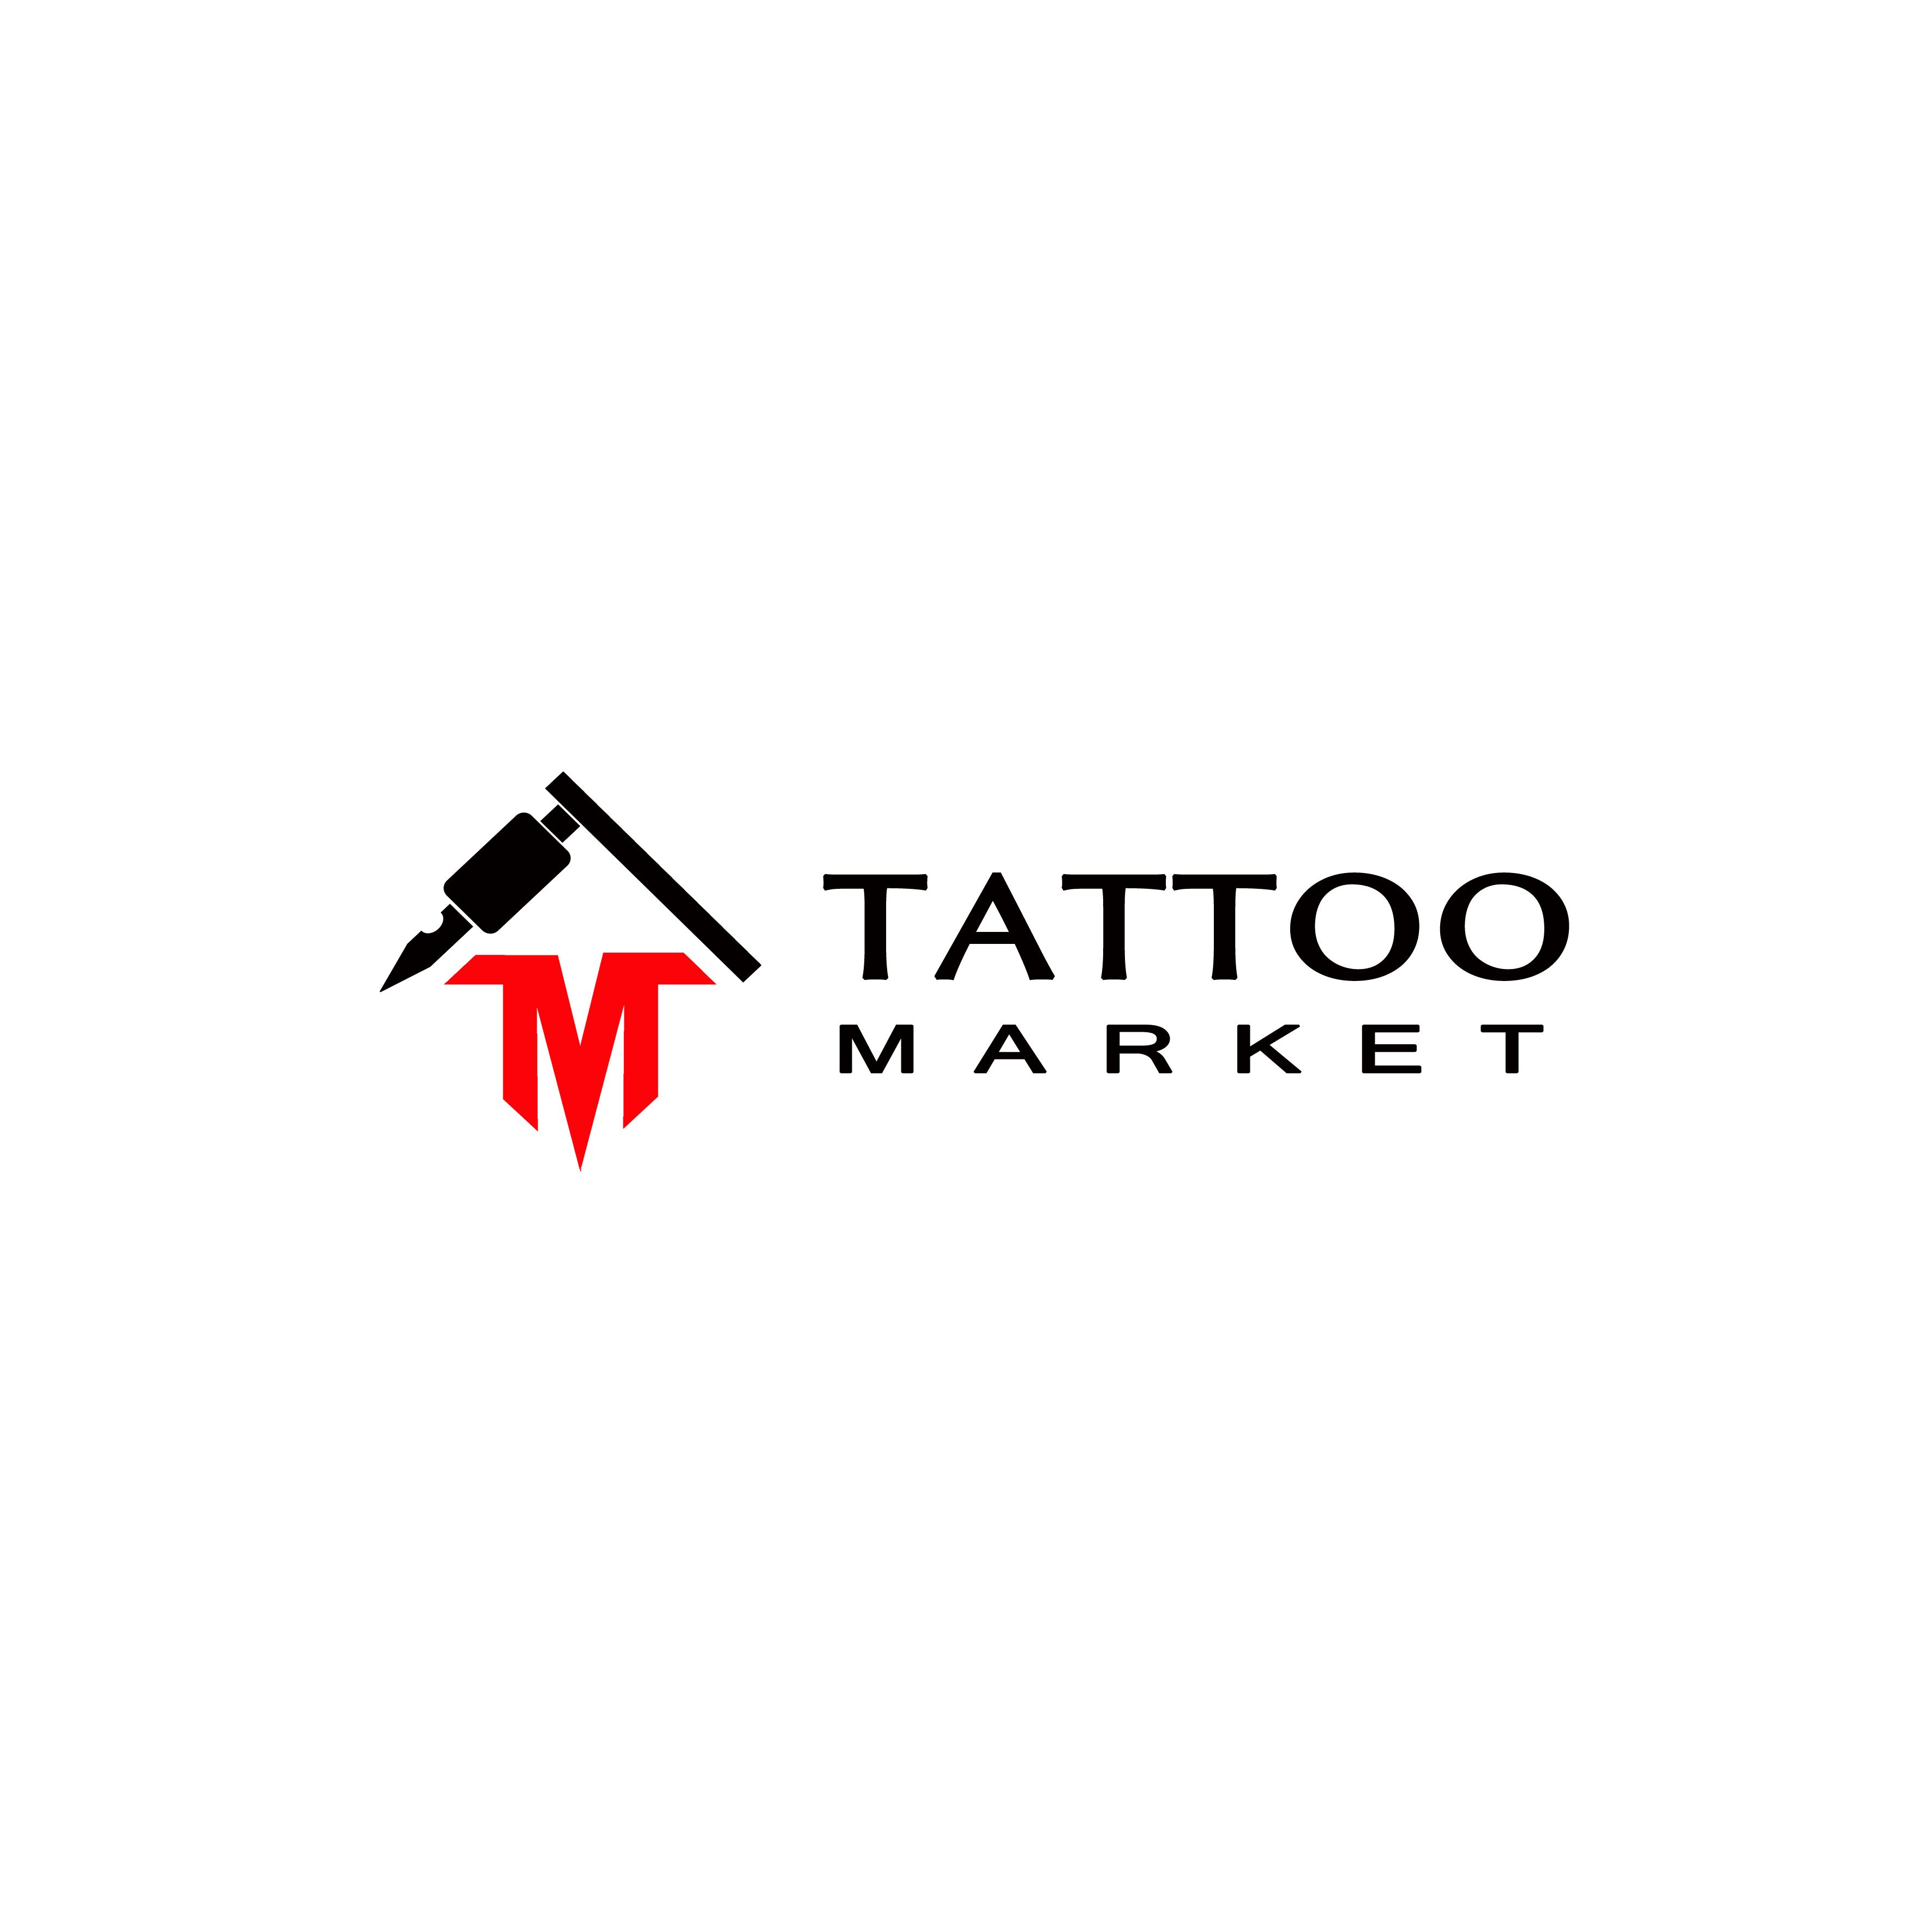 Редизайн логотипа магазина тату оборудования TattooMarket.ru фото f_0615c40b815257a8.jpg